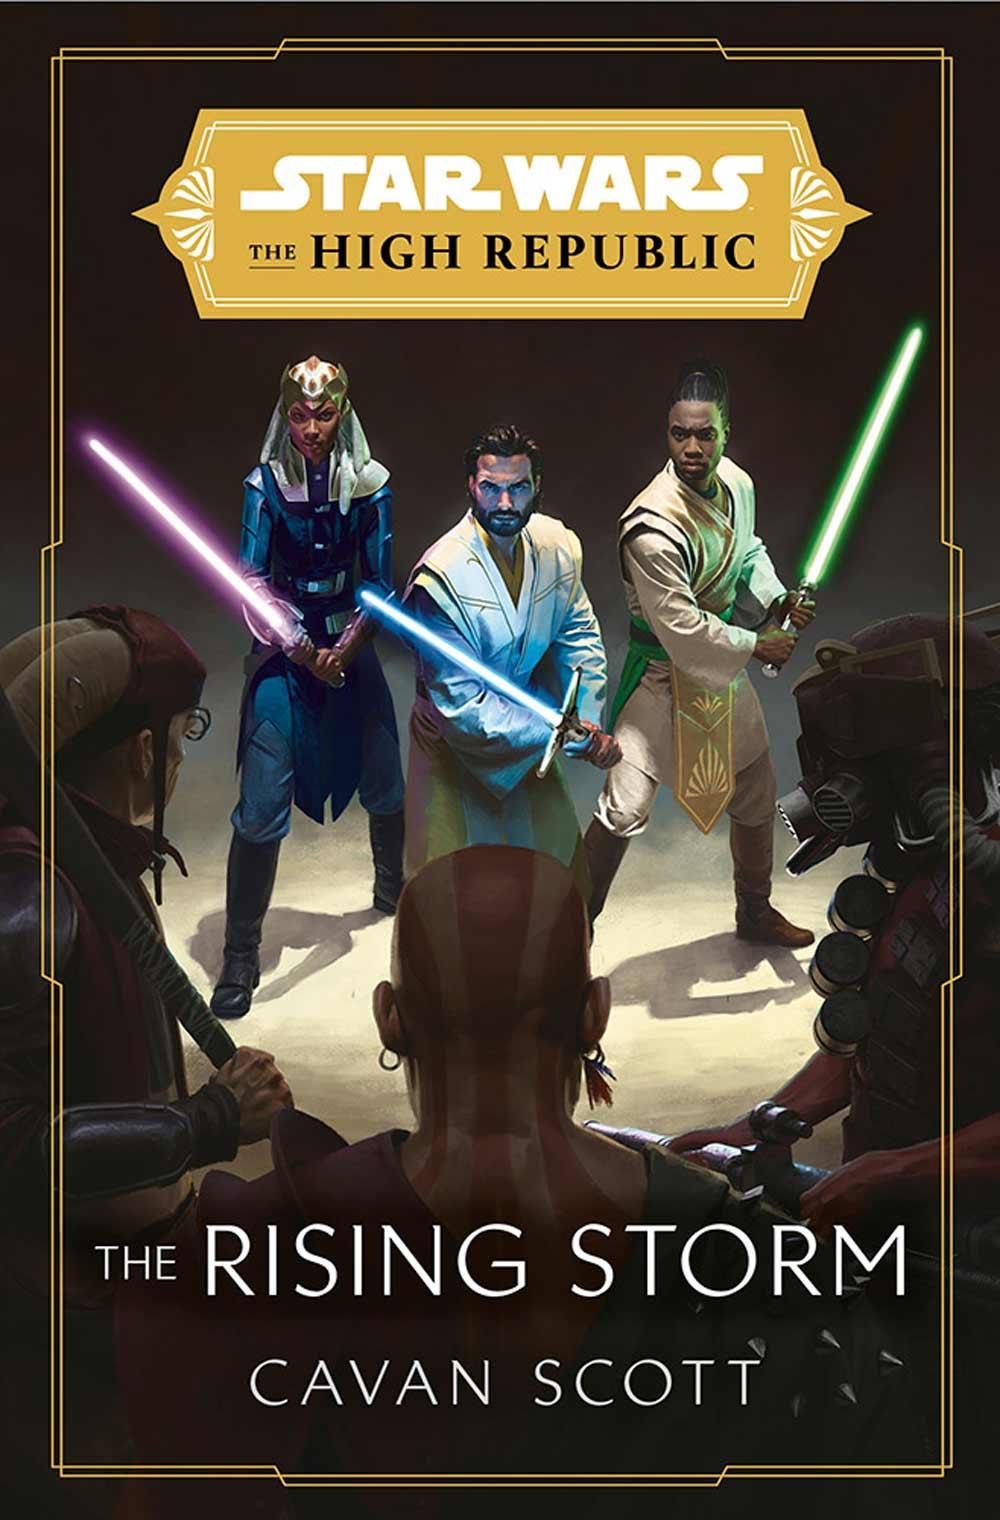 portada star wars the high republic rising storm